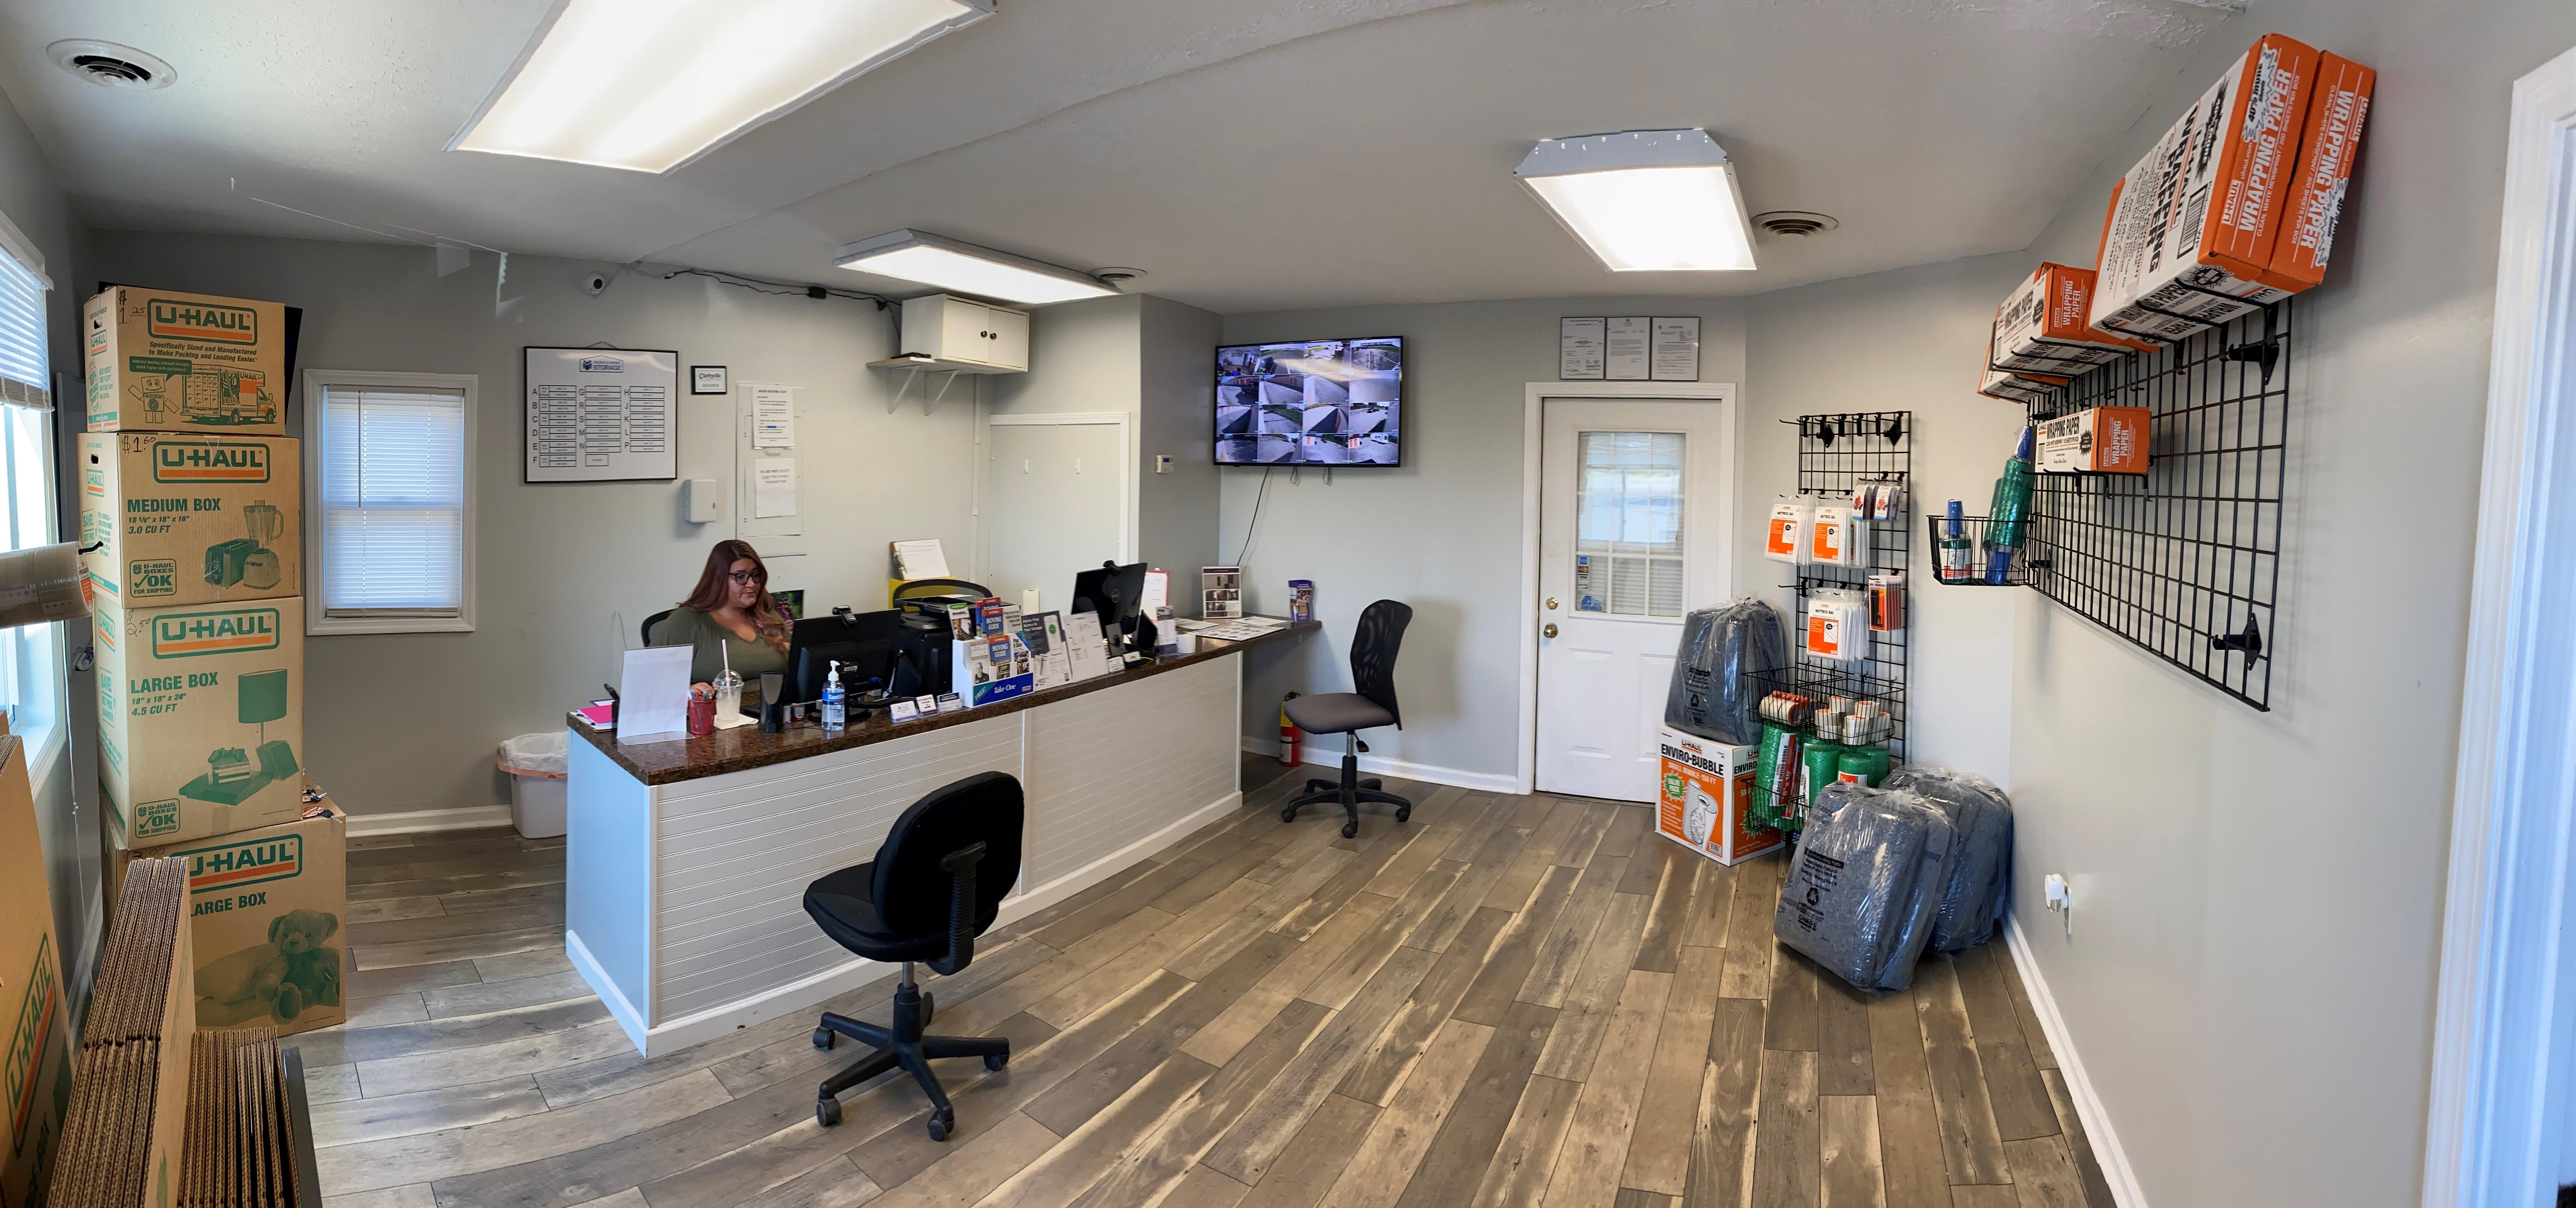 People's Choice Self Storage Office in Clarksville, TN